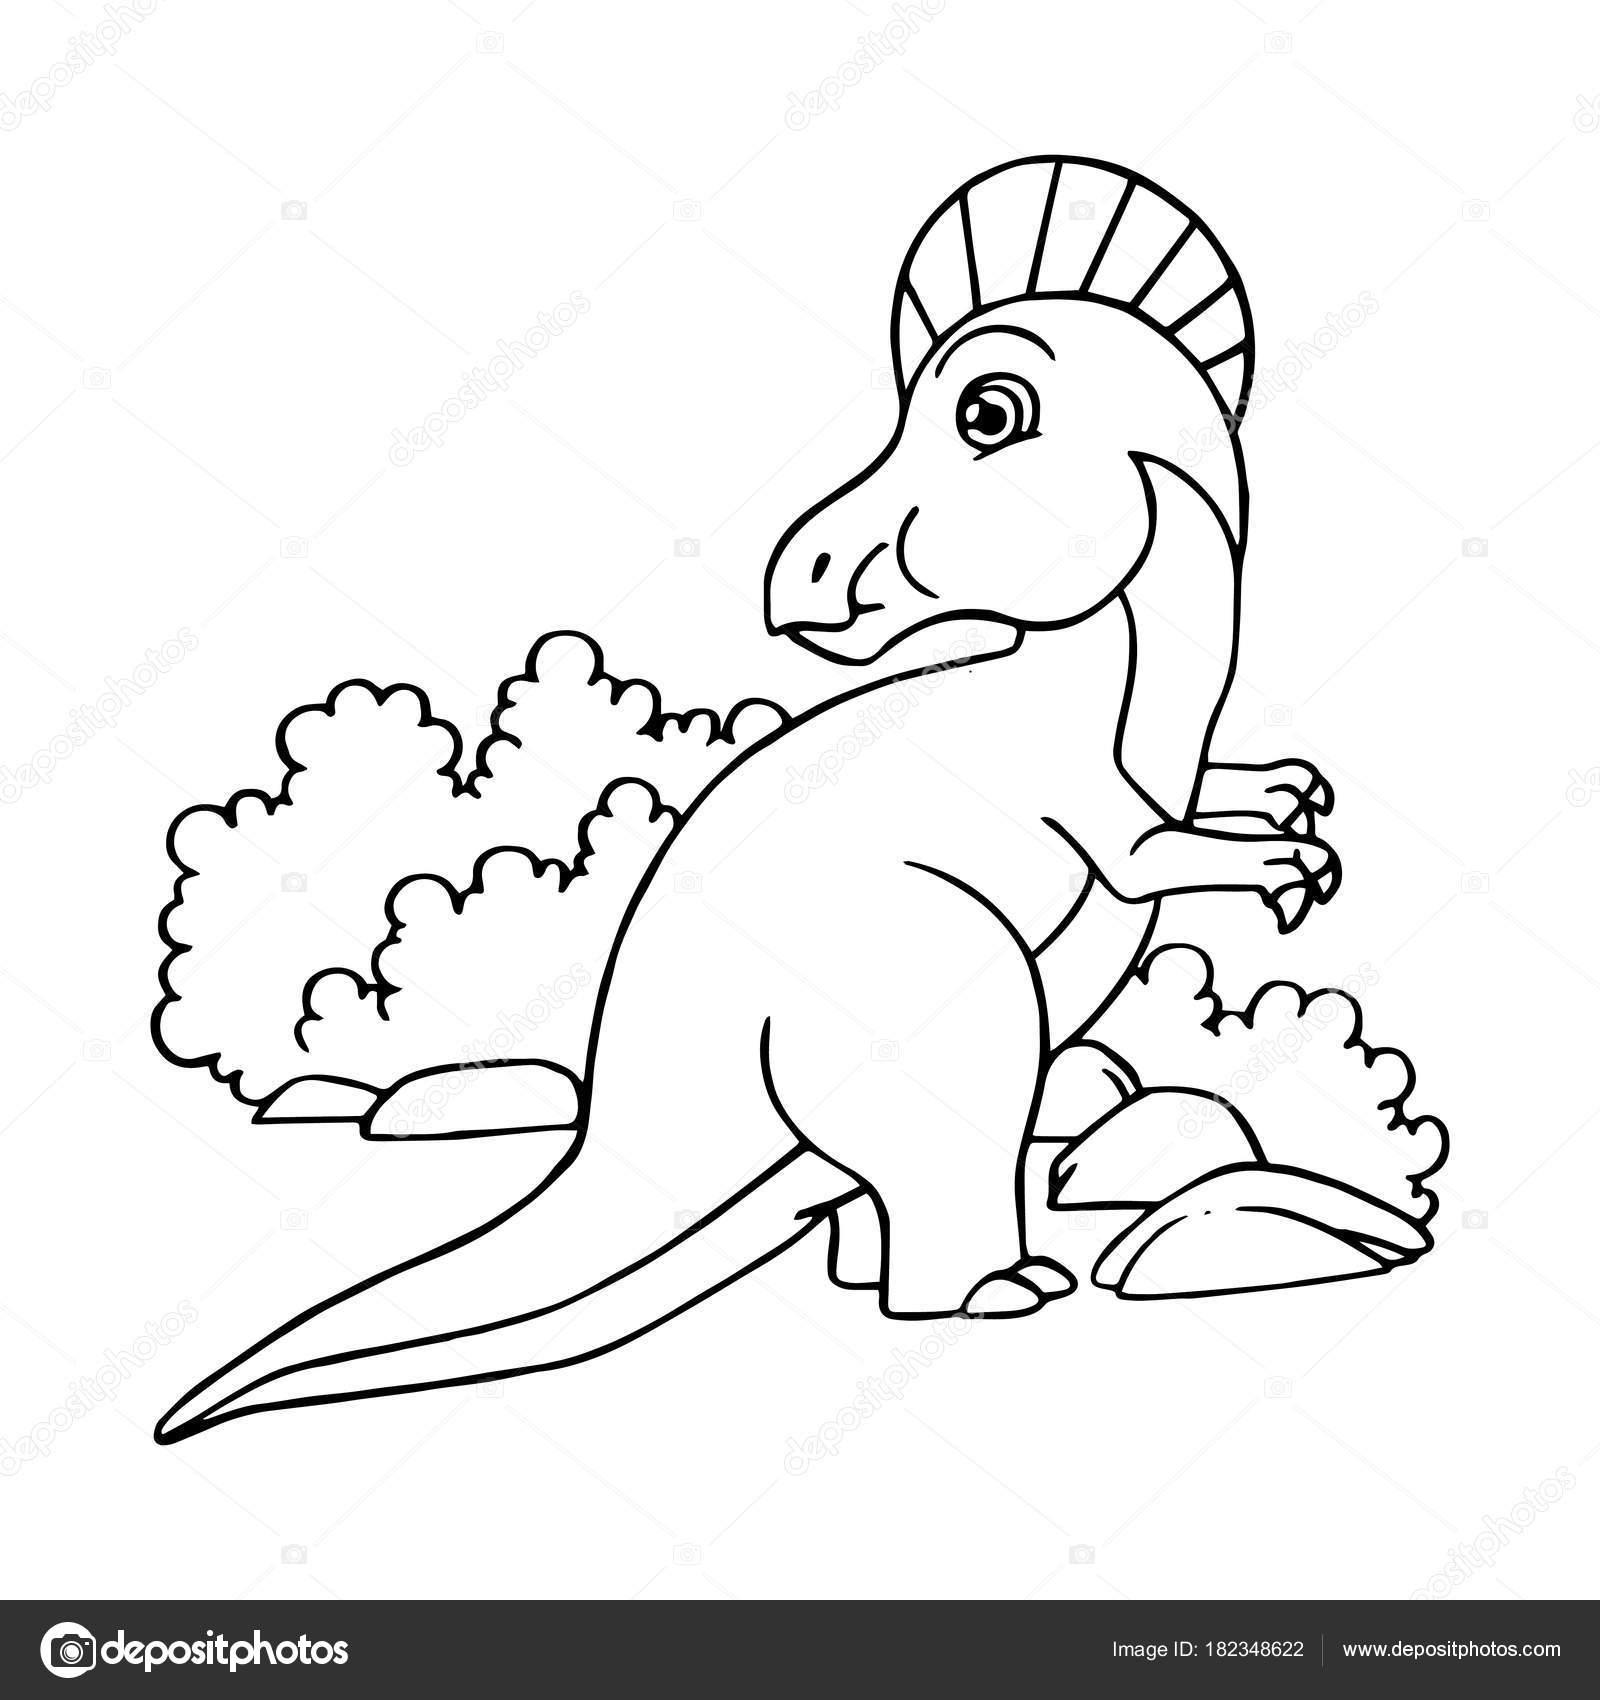 Impresiones Velociraptor Dibujos Animados Sobre Fondo Blanco Para ...